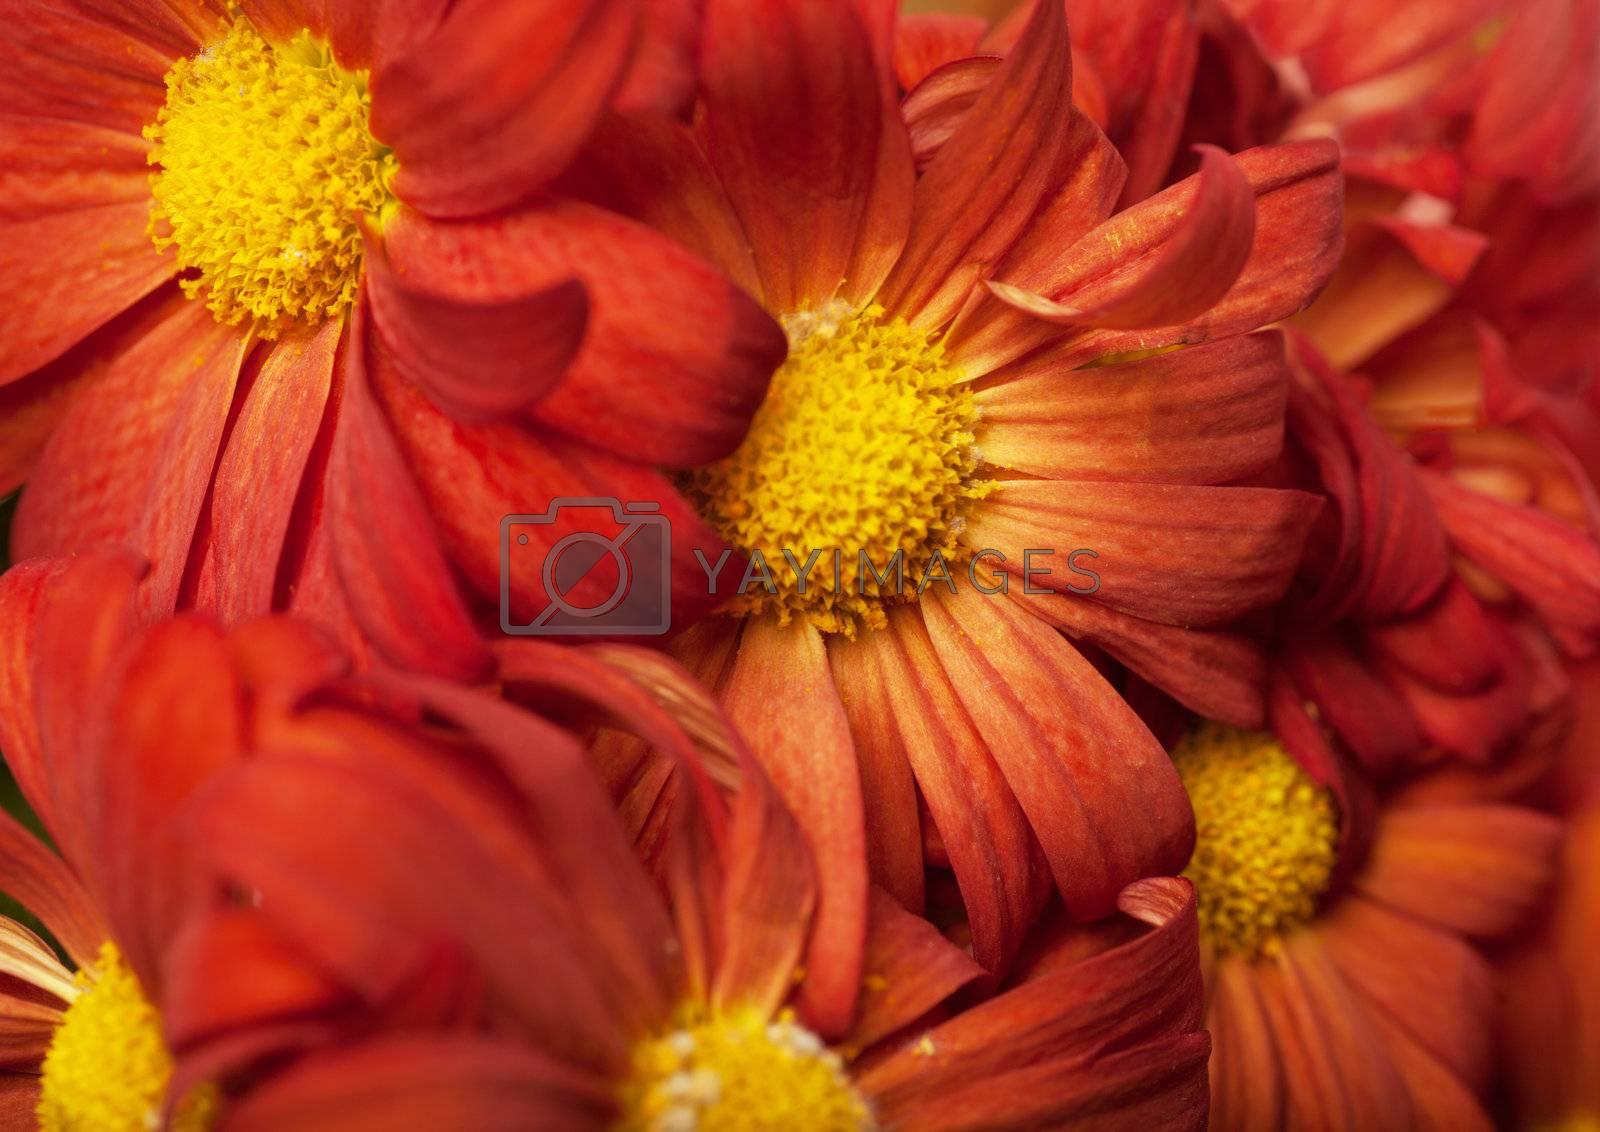 Royalty free image of Petals by AGorohov